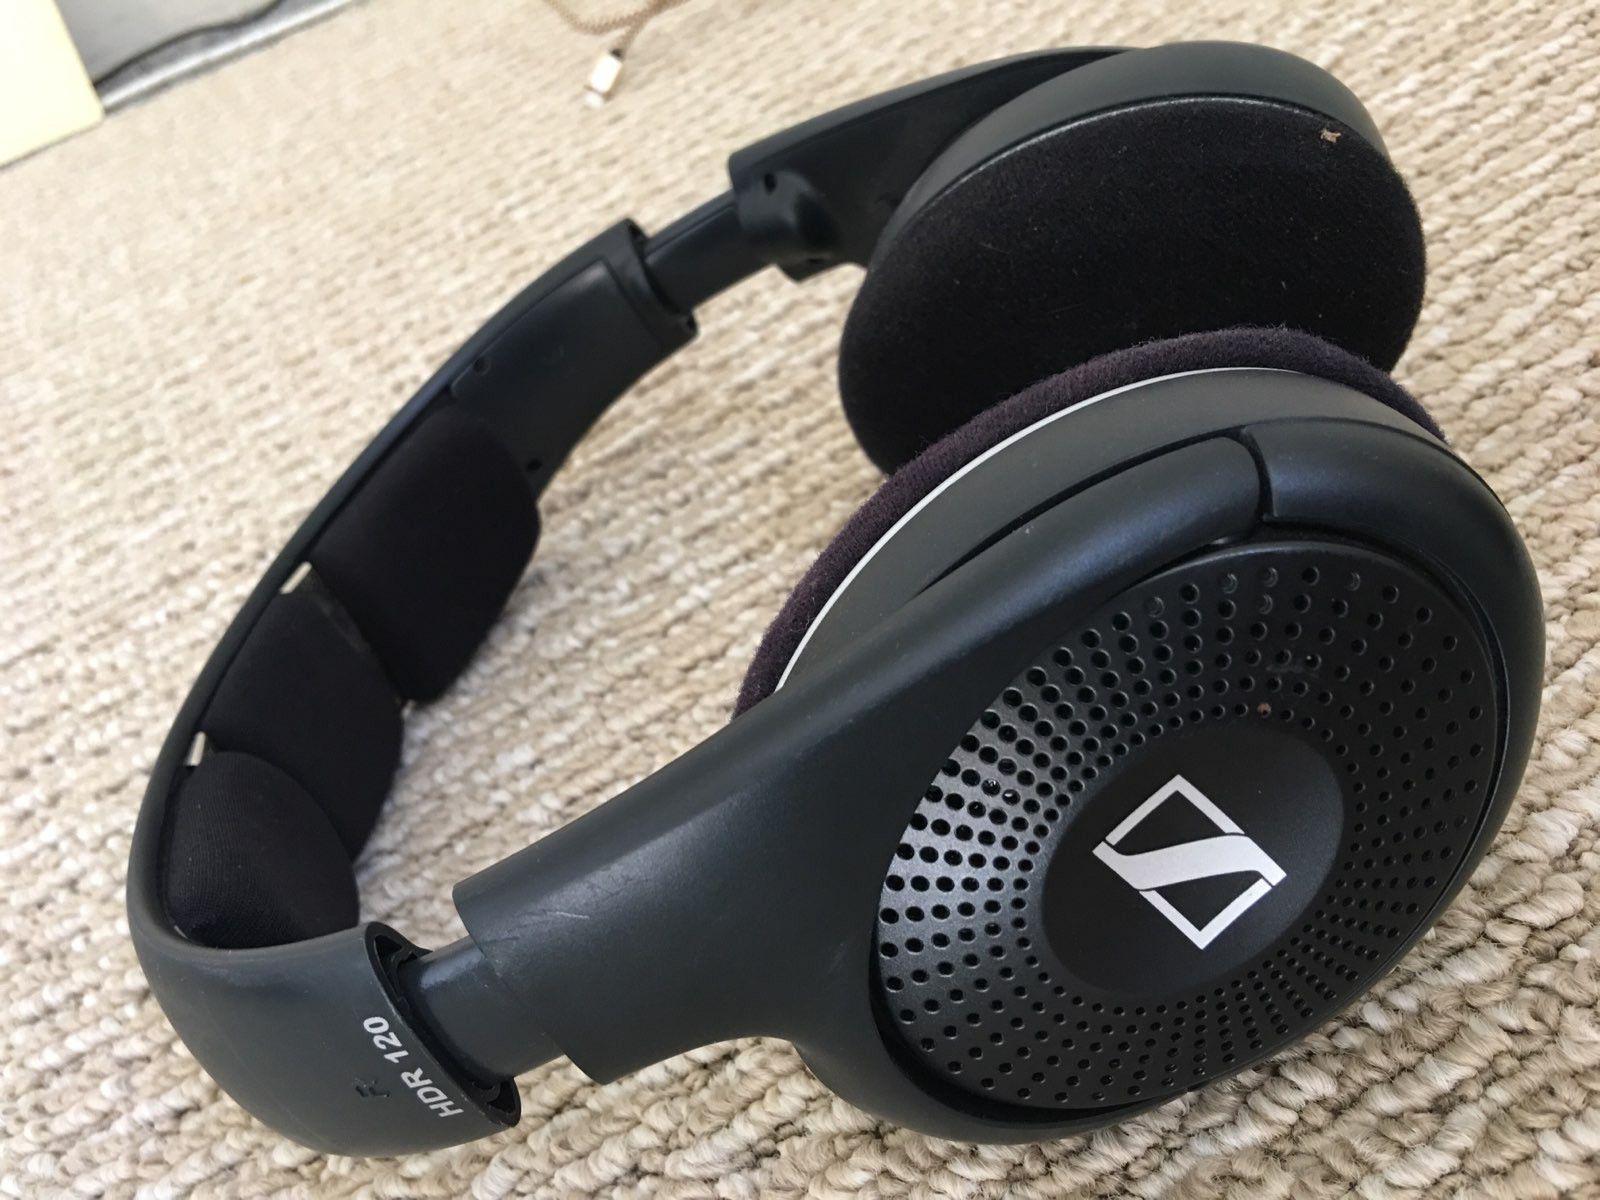 Sennheiser surround wireless headphones